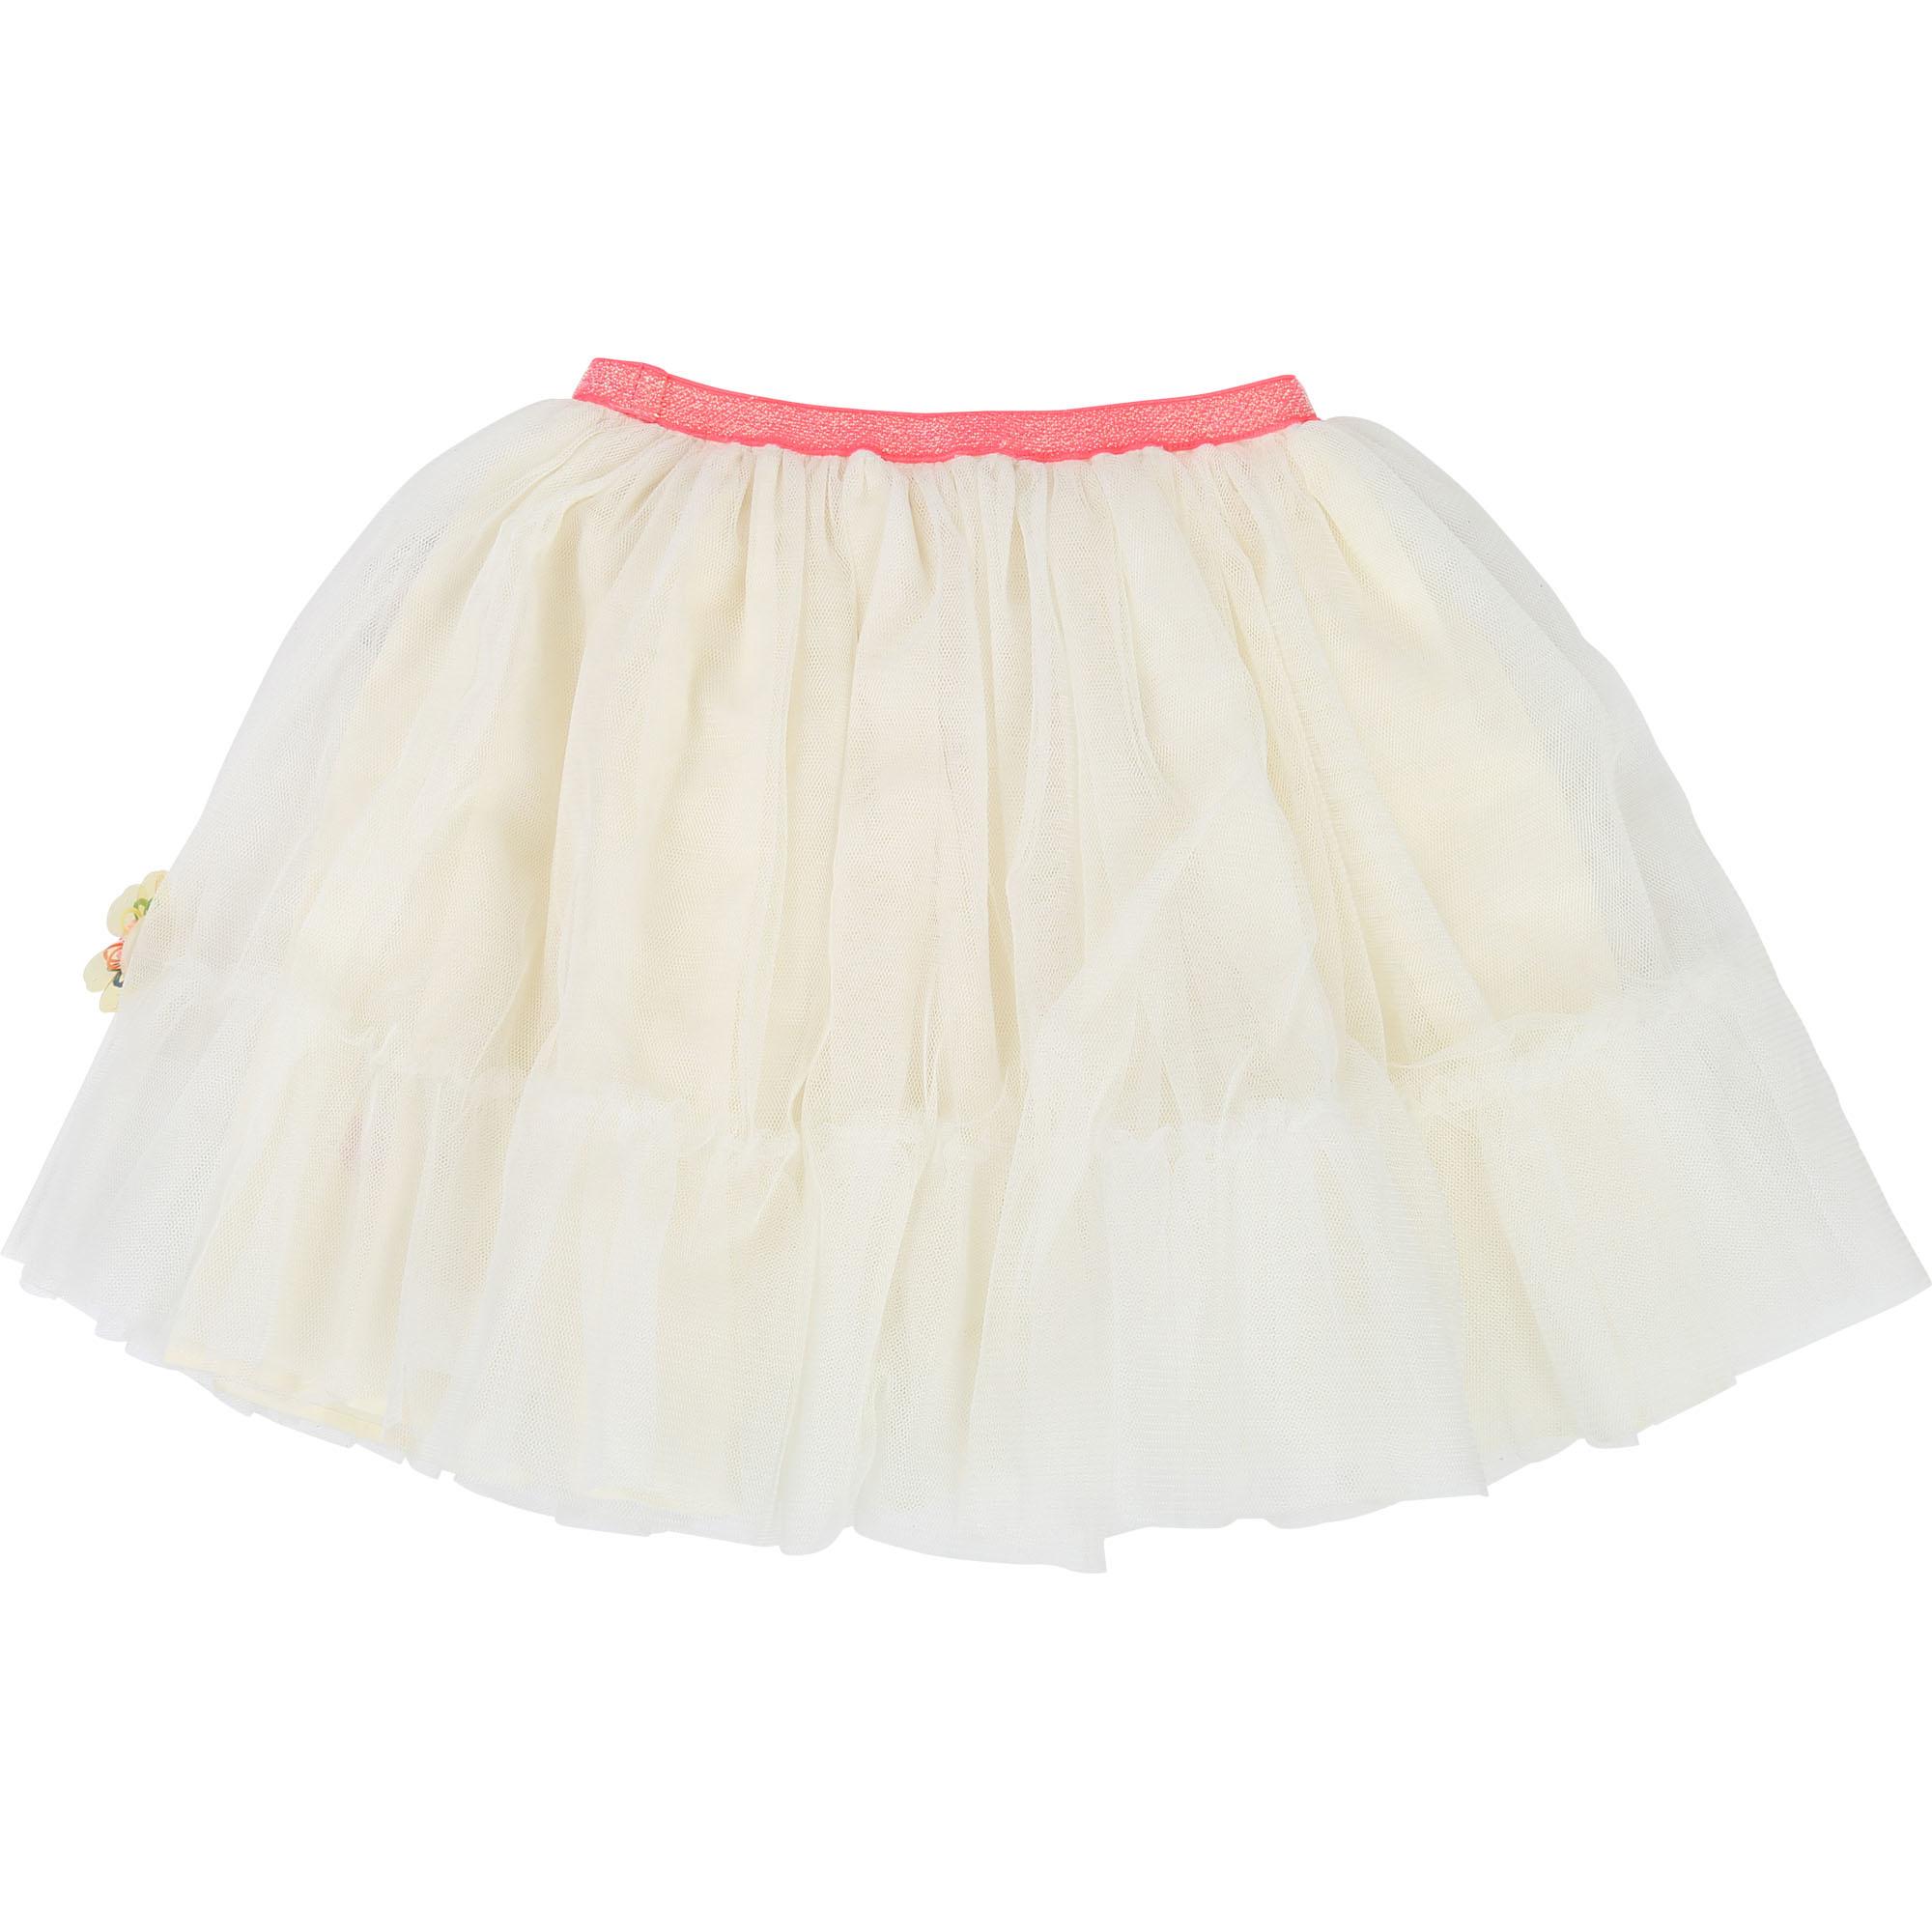 Billieblush Tulle Floral Skirt